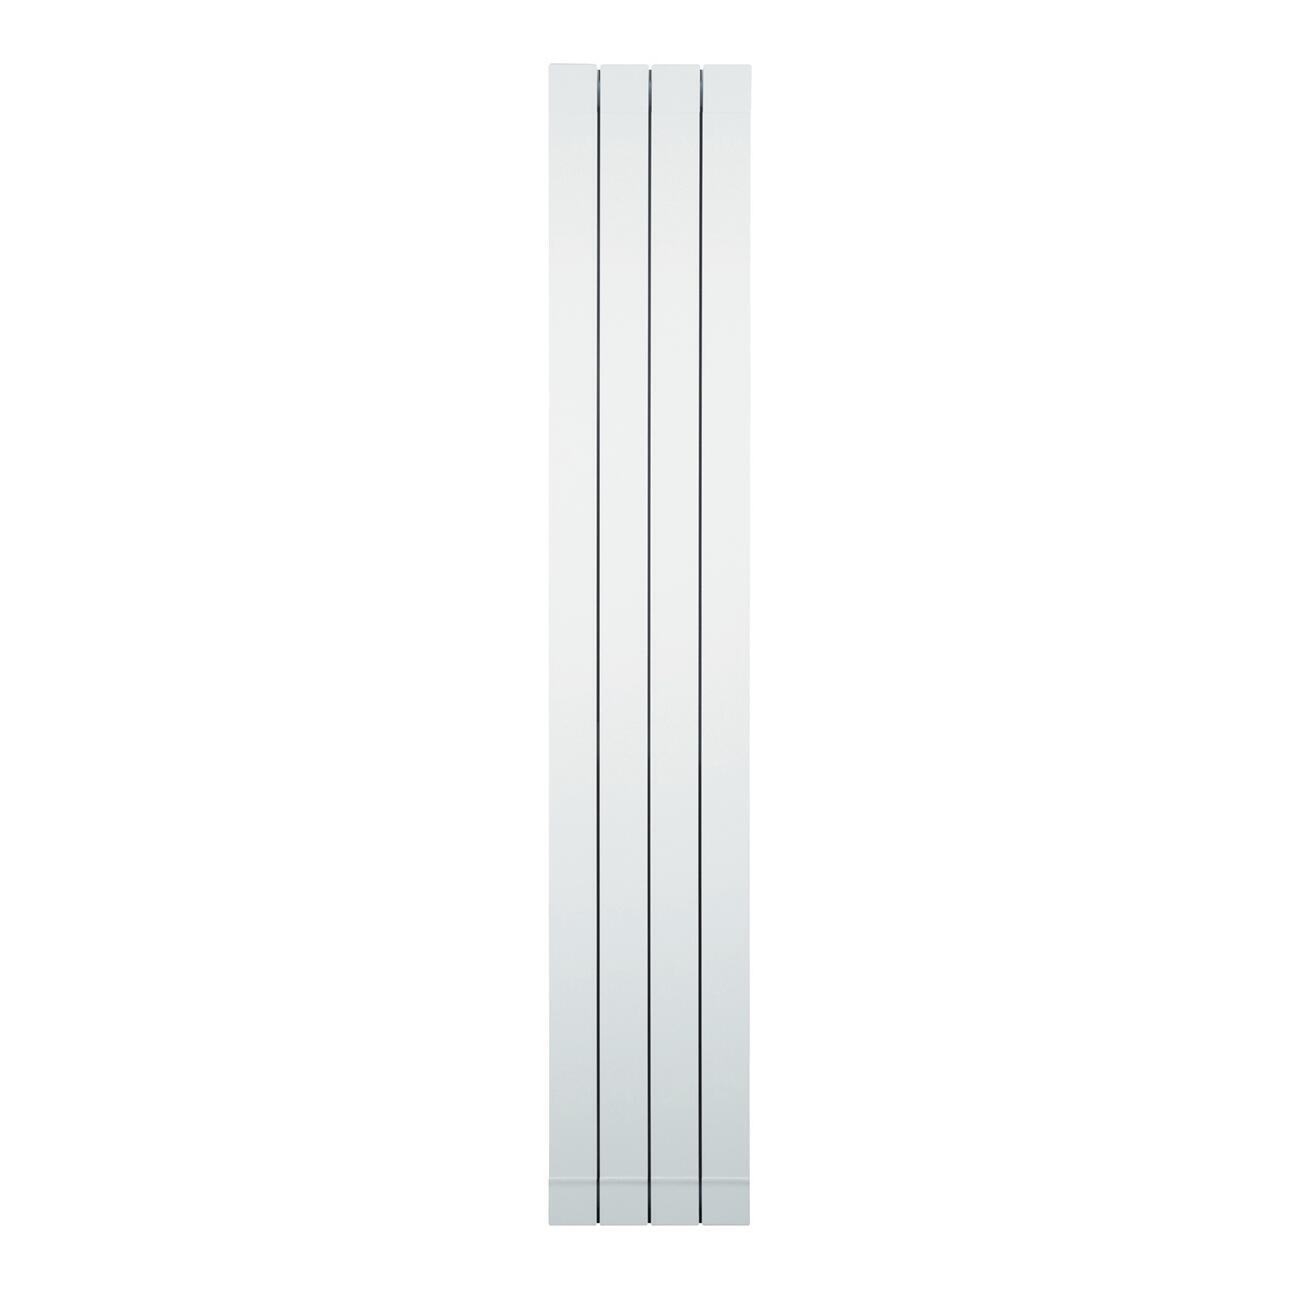 Radiatore acqua calda PRODIGE Superior in alluminio 4 elementi interasse 180 cm - 4